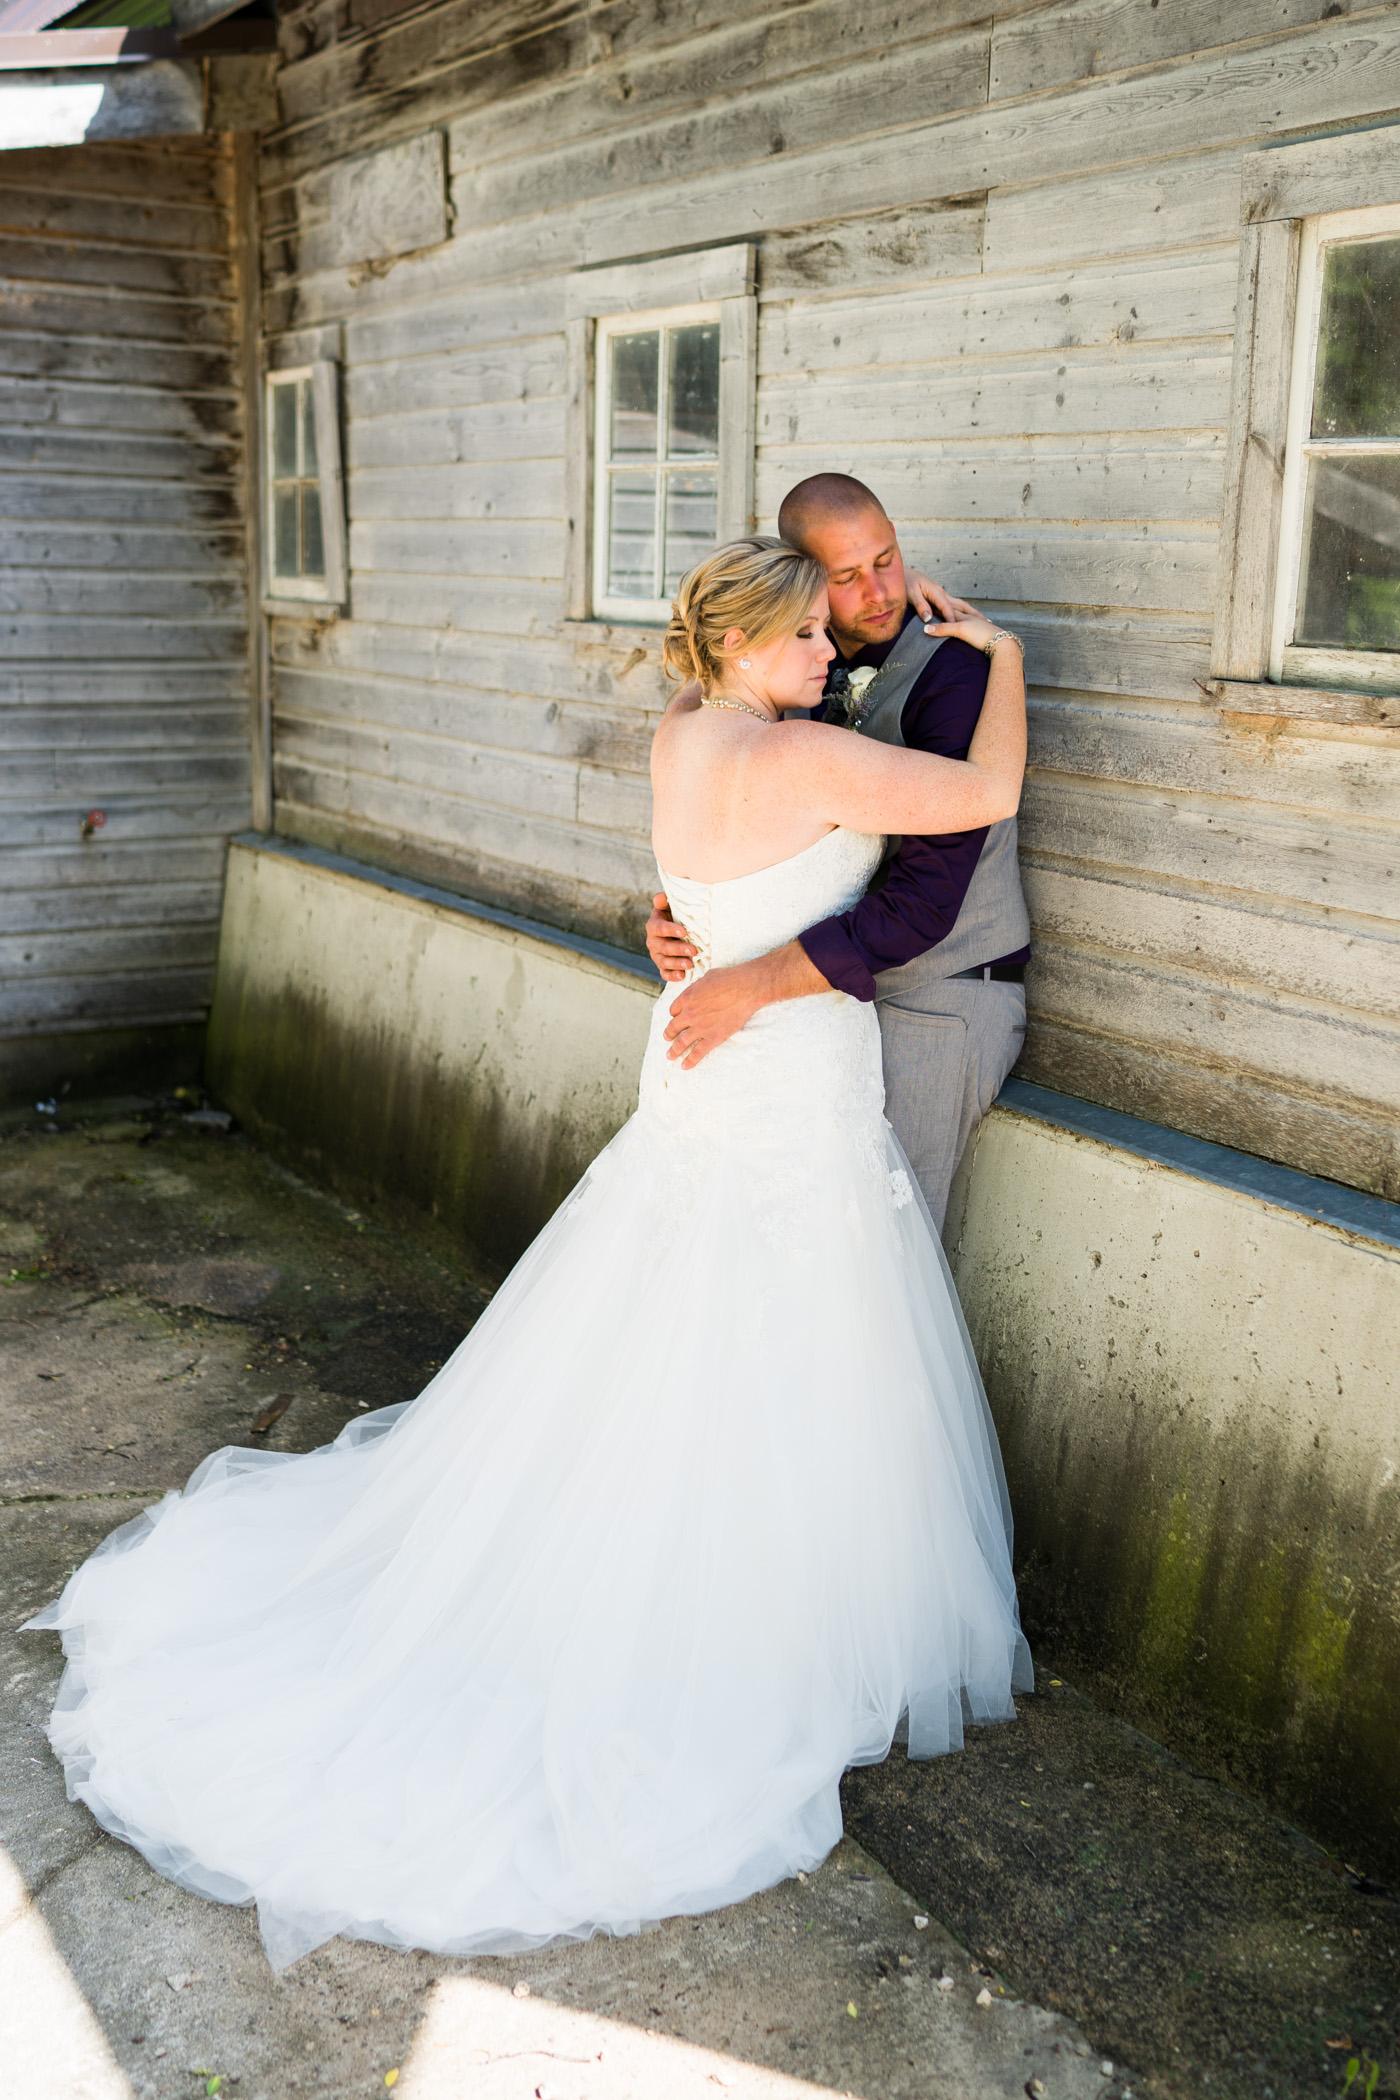 COJO Photo - Whitney and Steve - Wedding-915.jpg